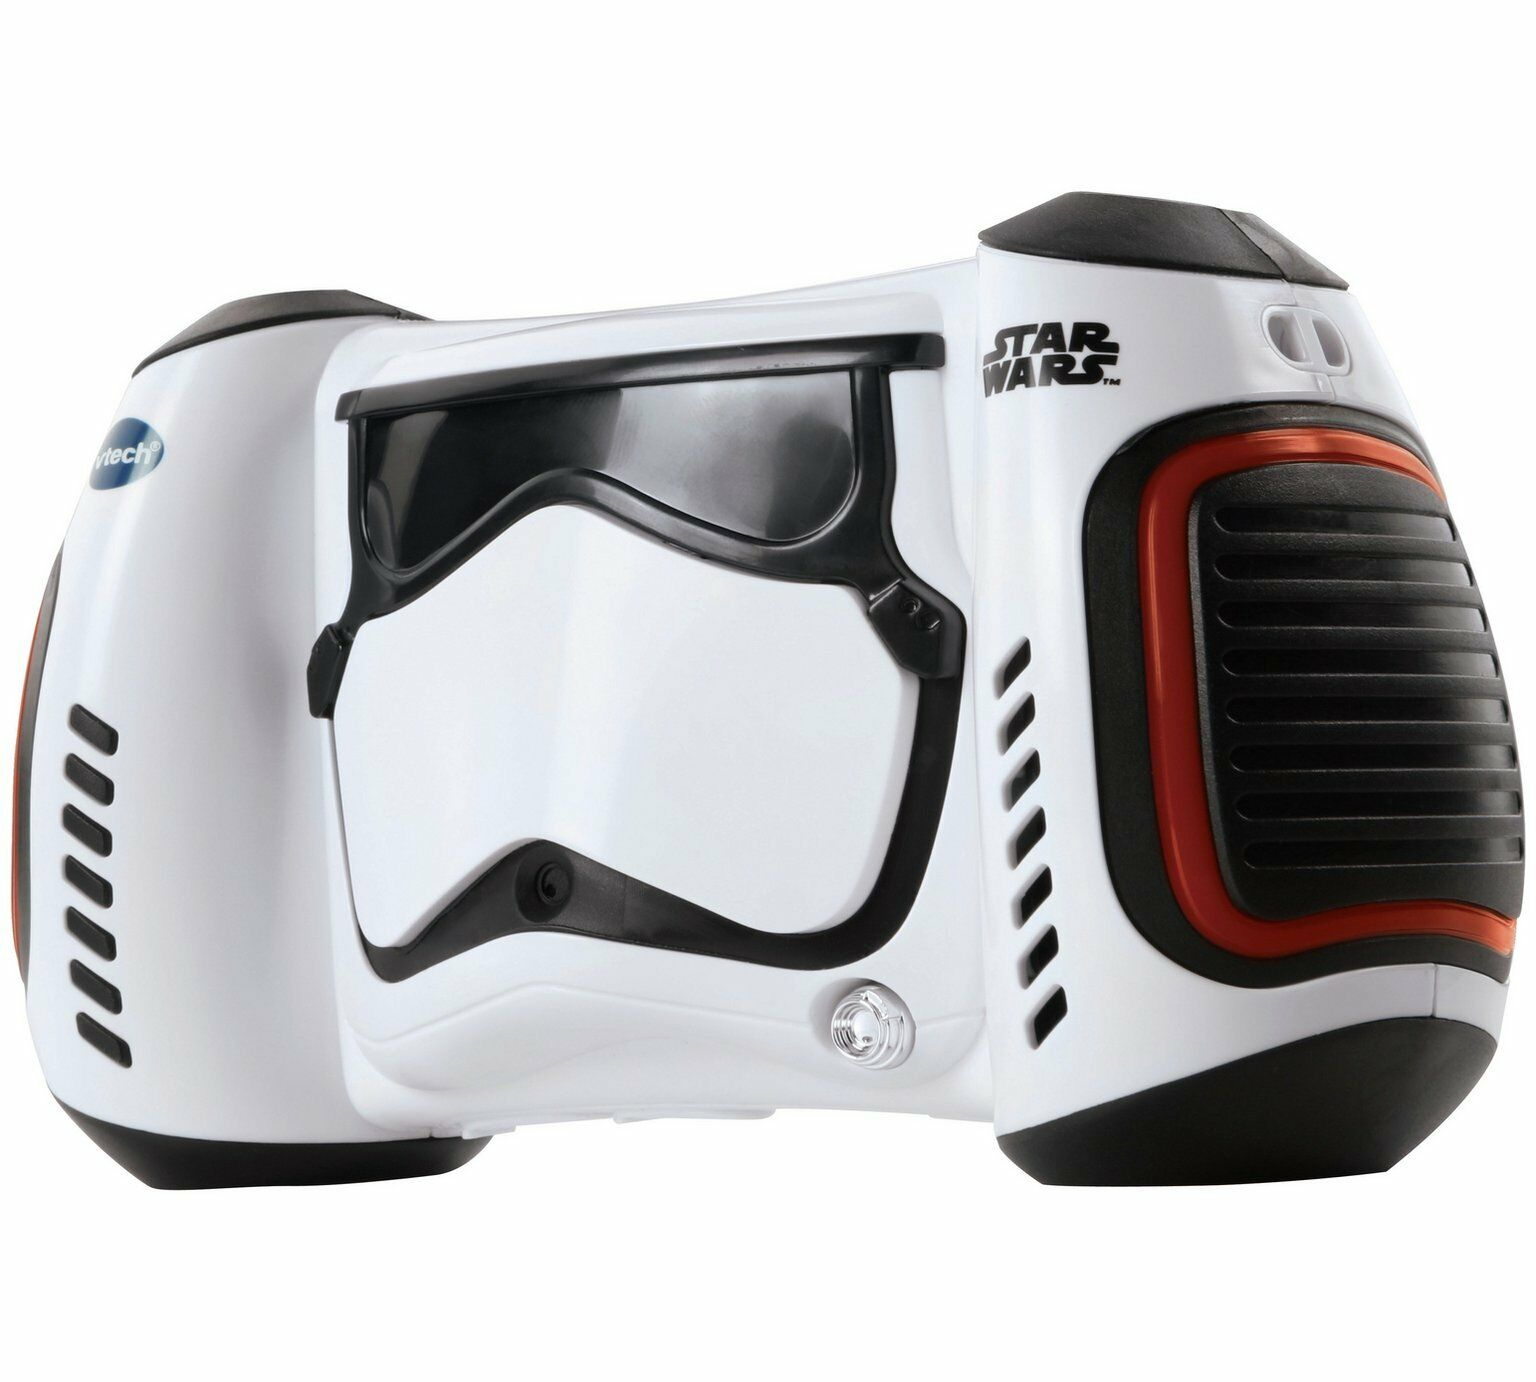 NEW VTech Star War Kids Stormtrooper Digital Camera Mini Games Games Games Birthday Gift 471493